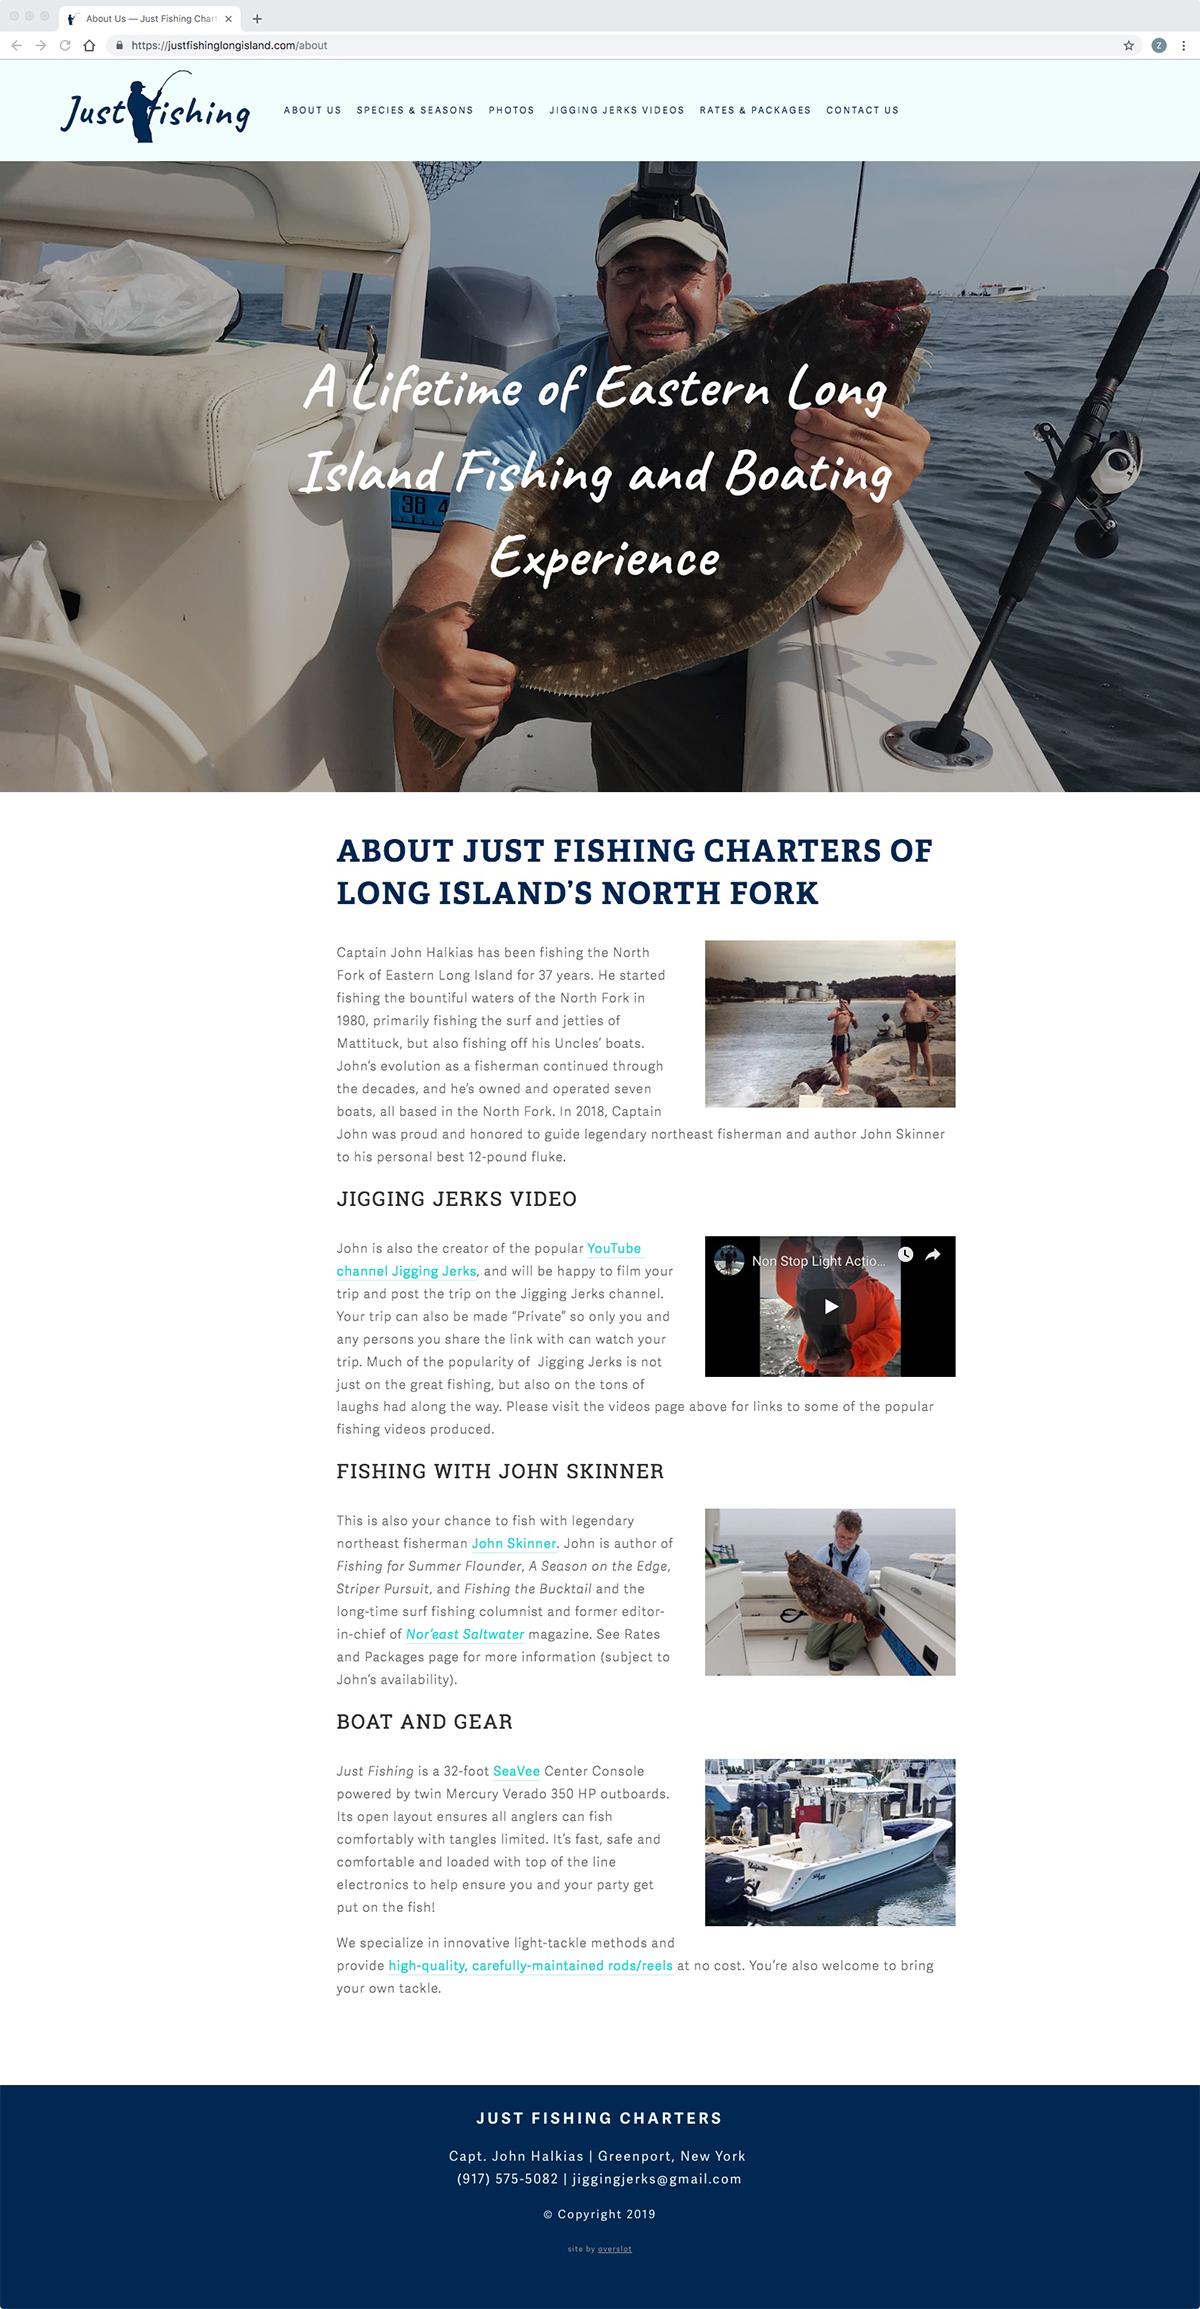 just-fishing-grabf.jpg